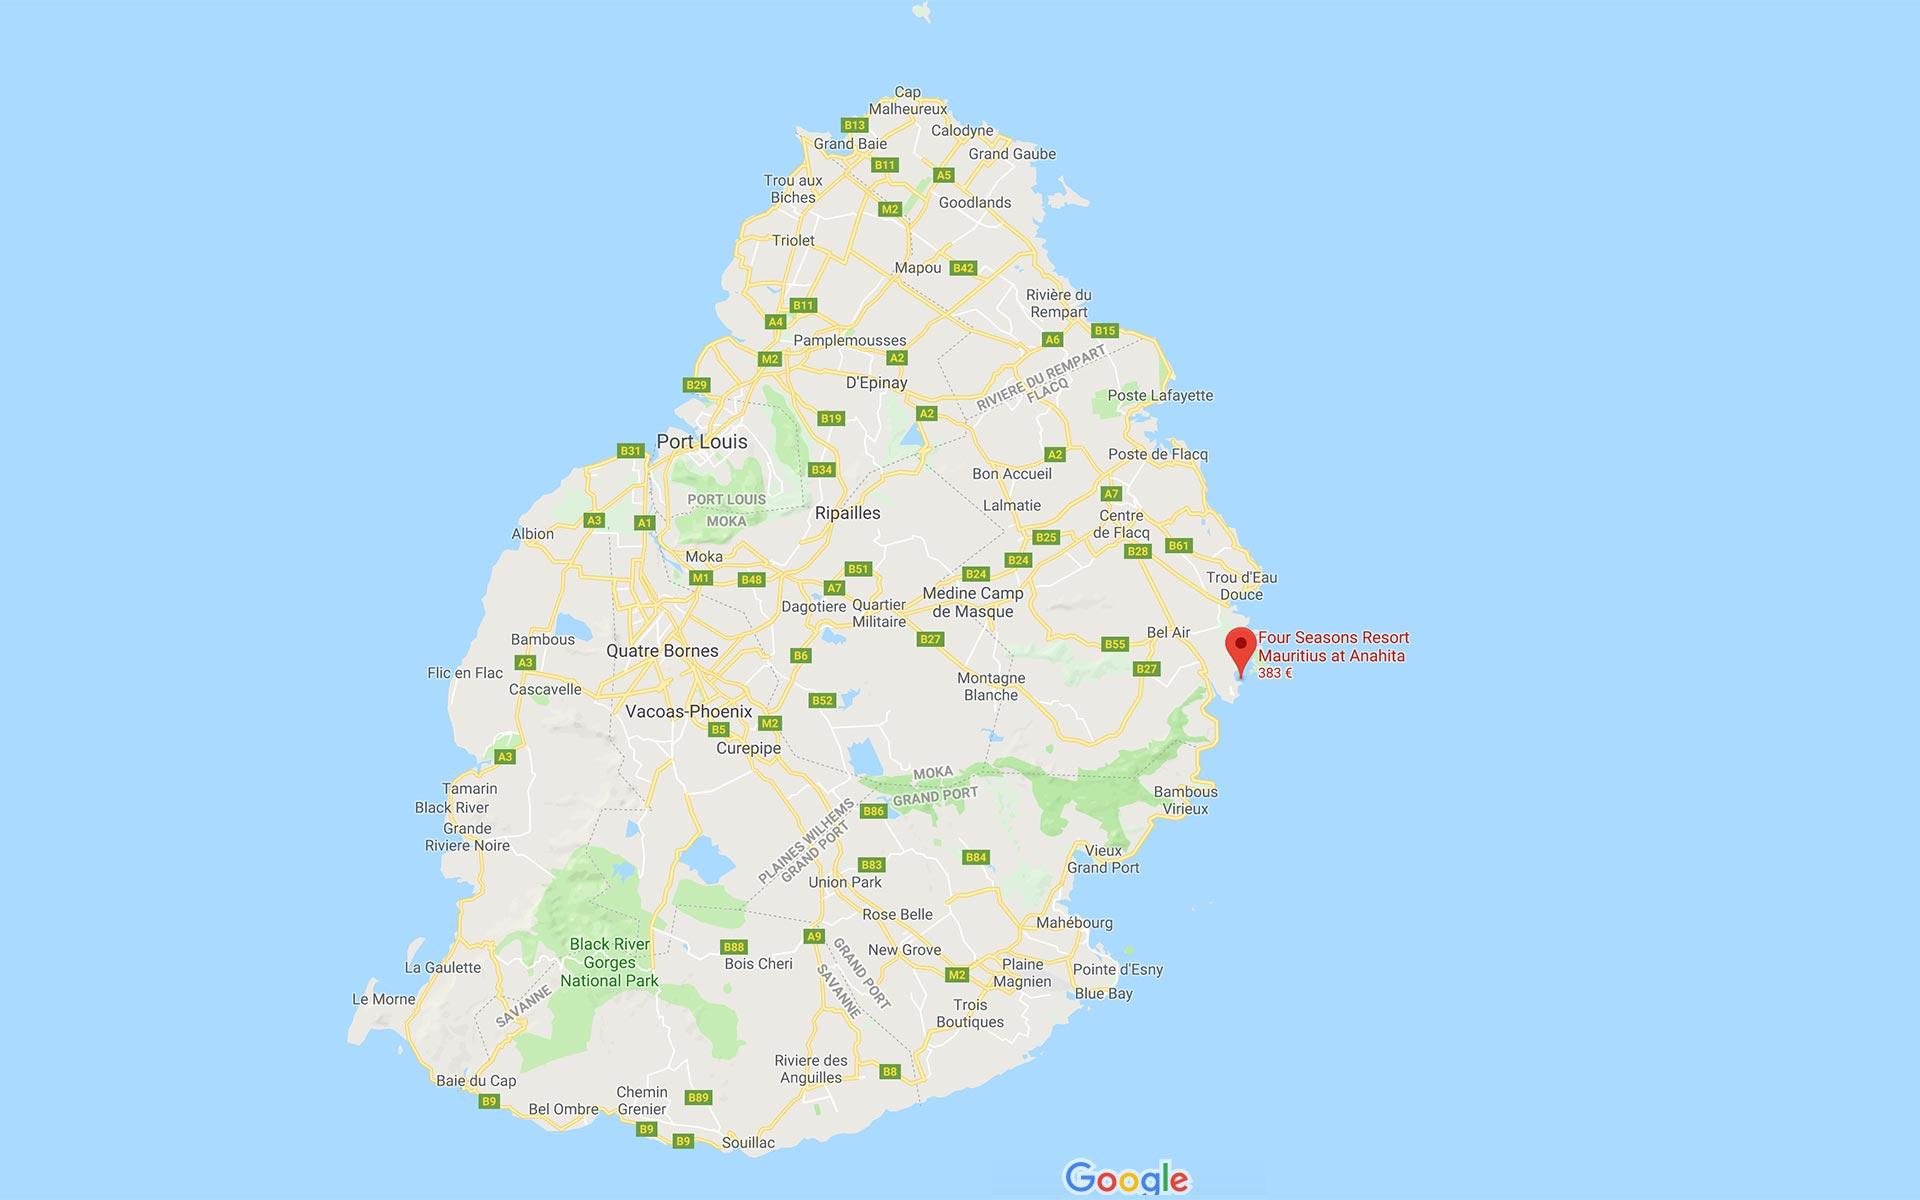 Mauritius Google Maps